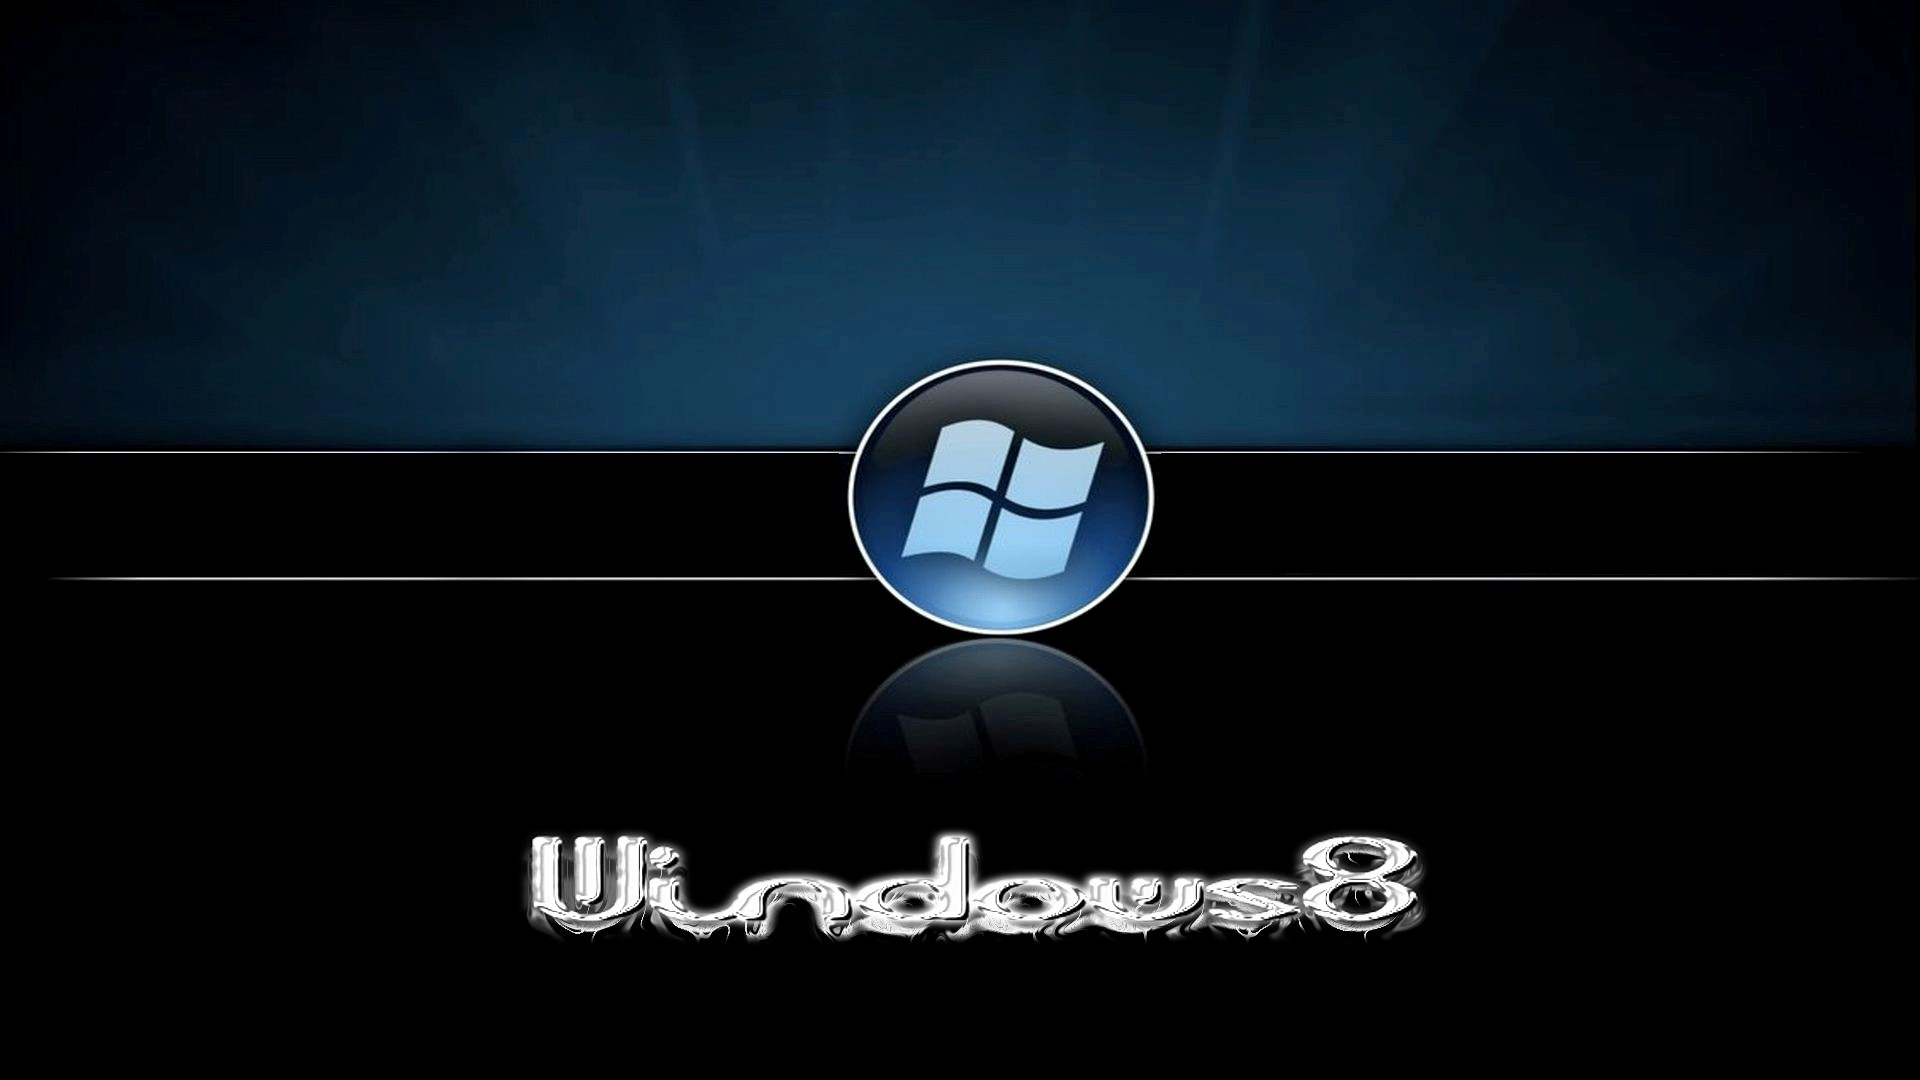 3d custom windows 8 wallpapers by tiger windows 8 hd wallpaper html